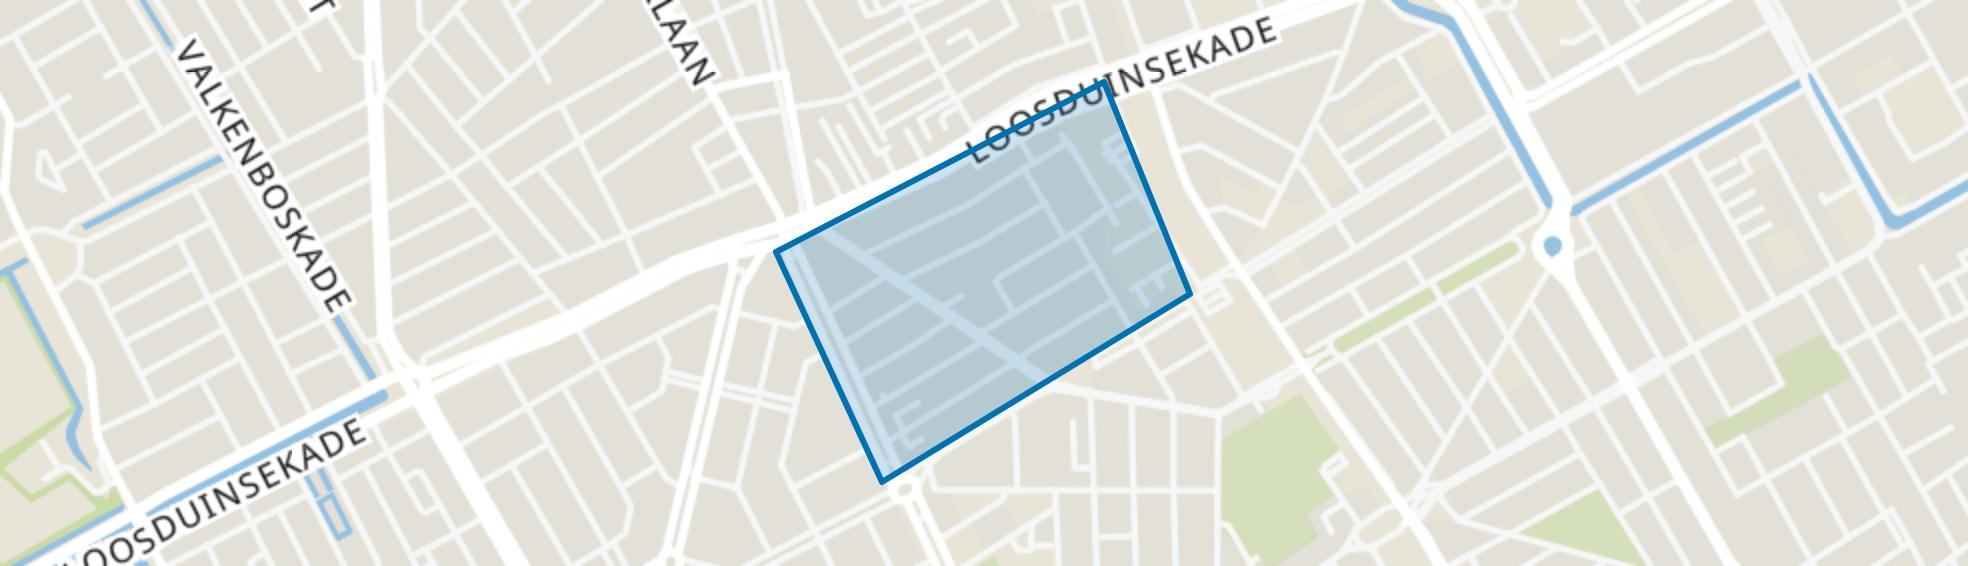 Transvaalkwartier-Noord, Den Haag map